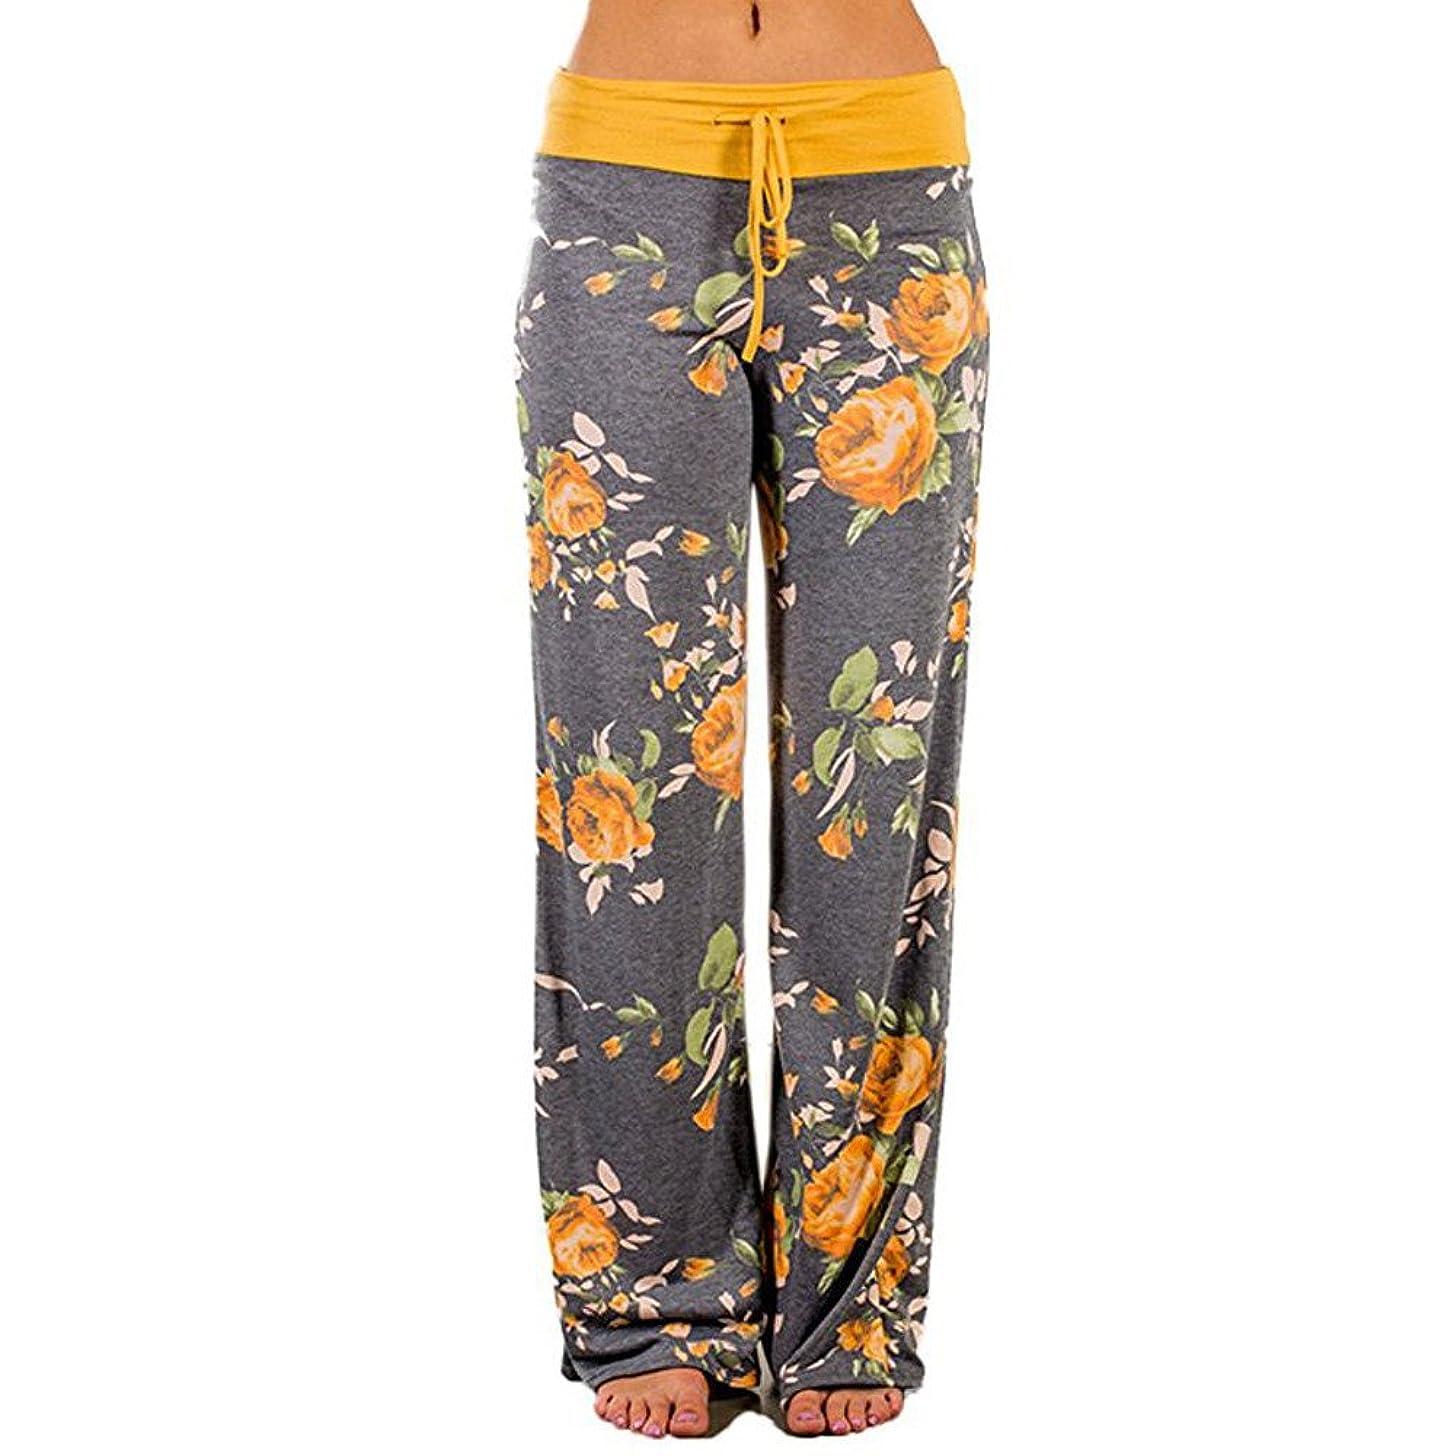 F_topbu Womens Pants Casual High Waist Comfy Stretch Floral Print Drawstring Palazzo Wide Leg Lounge Pants